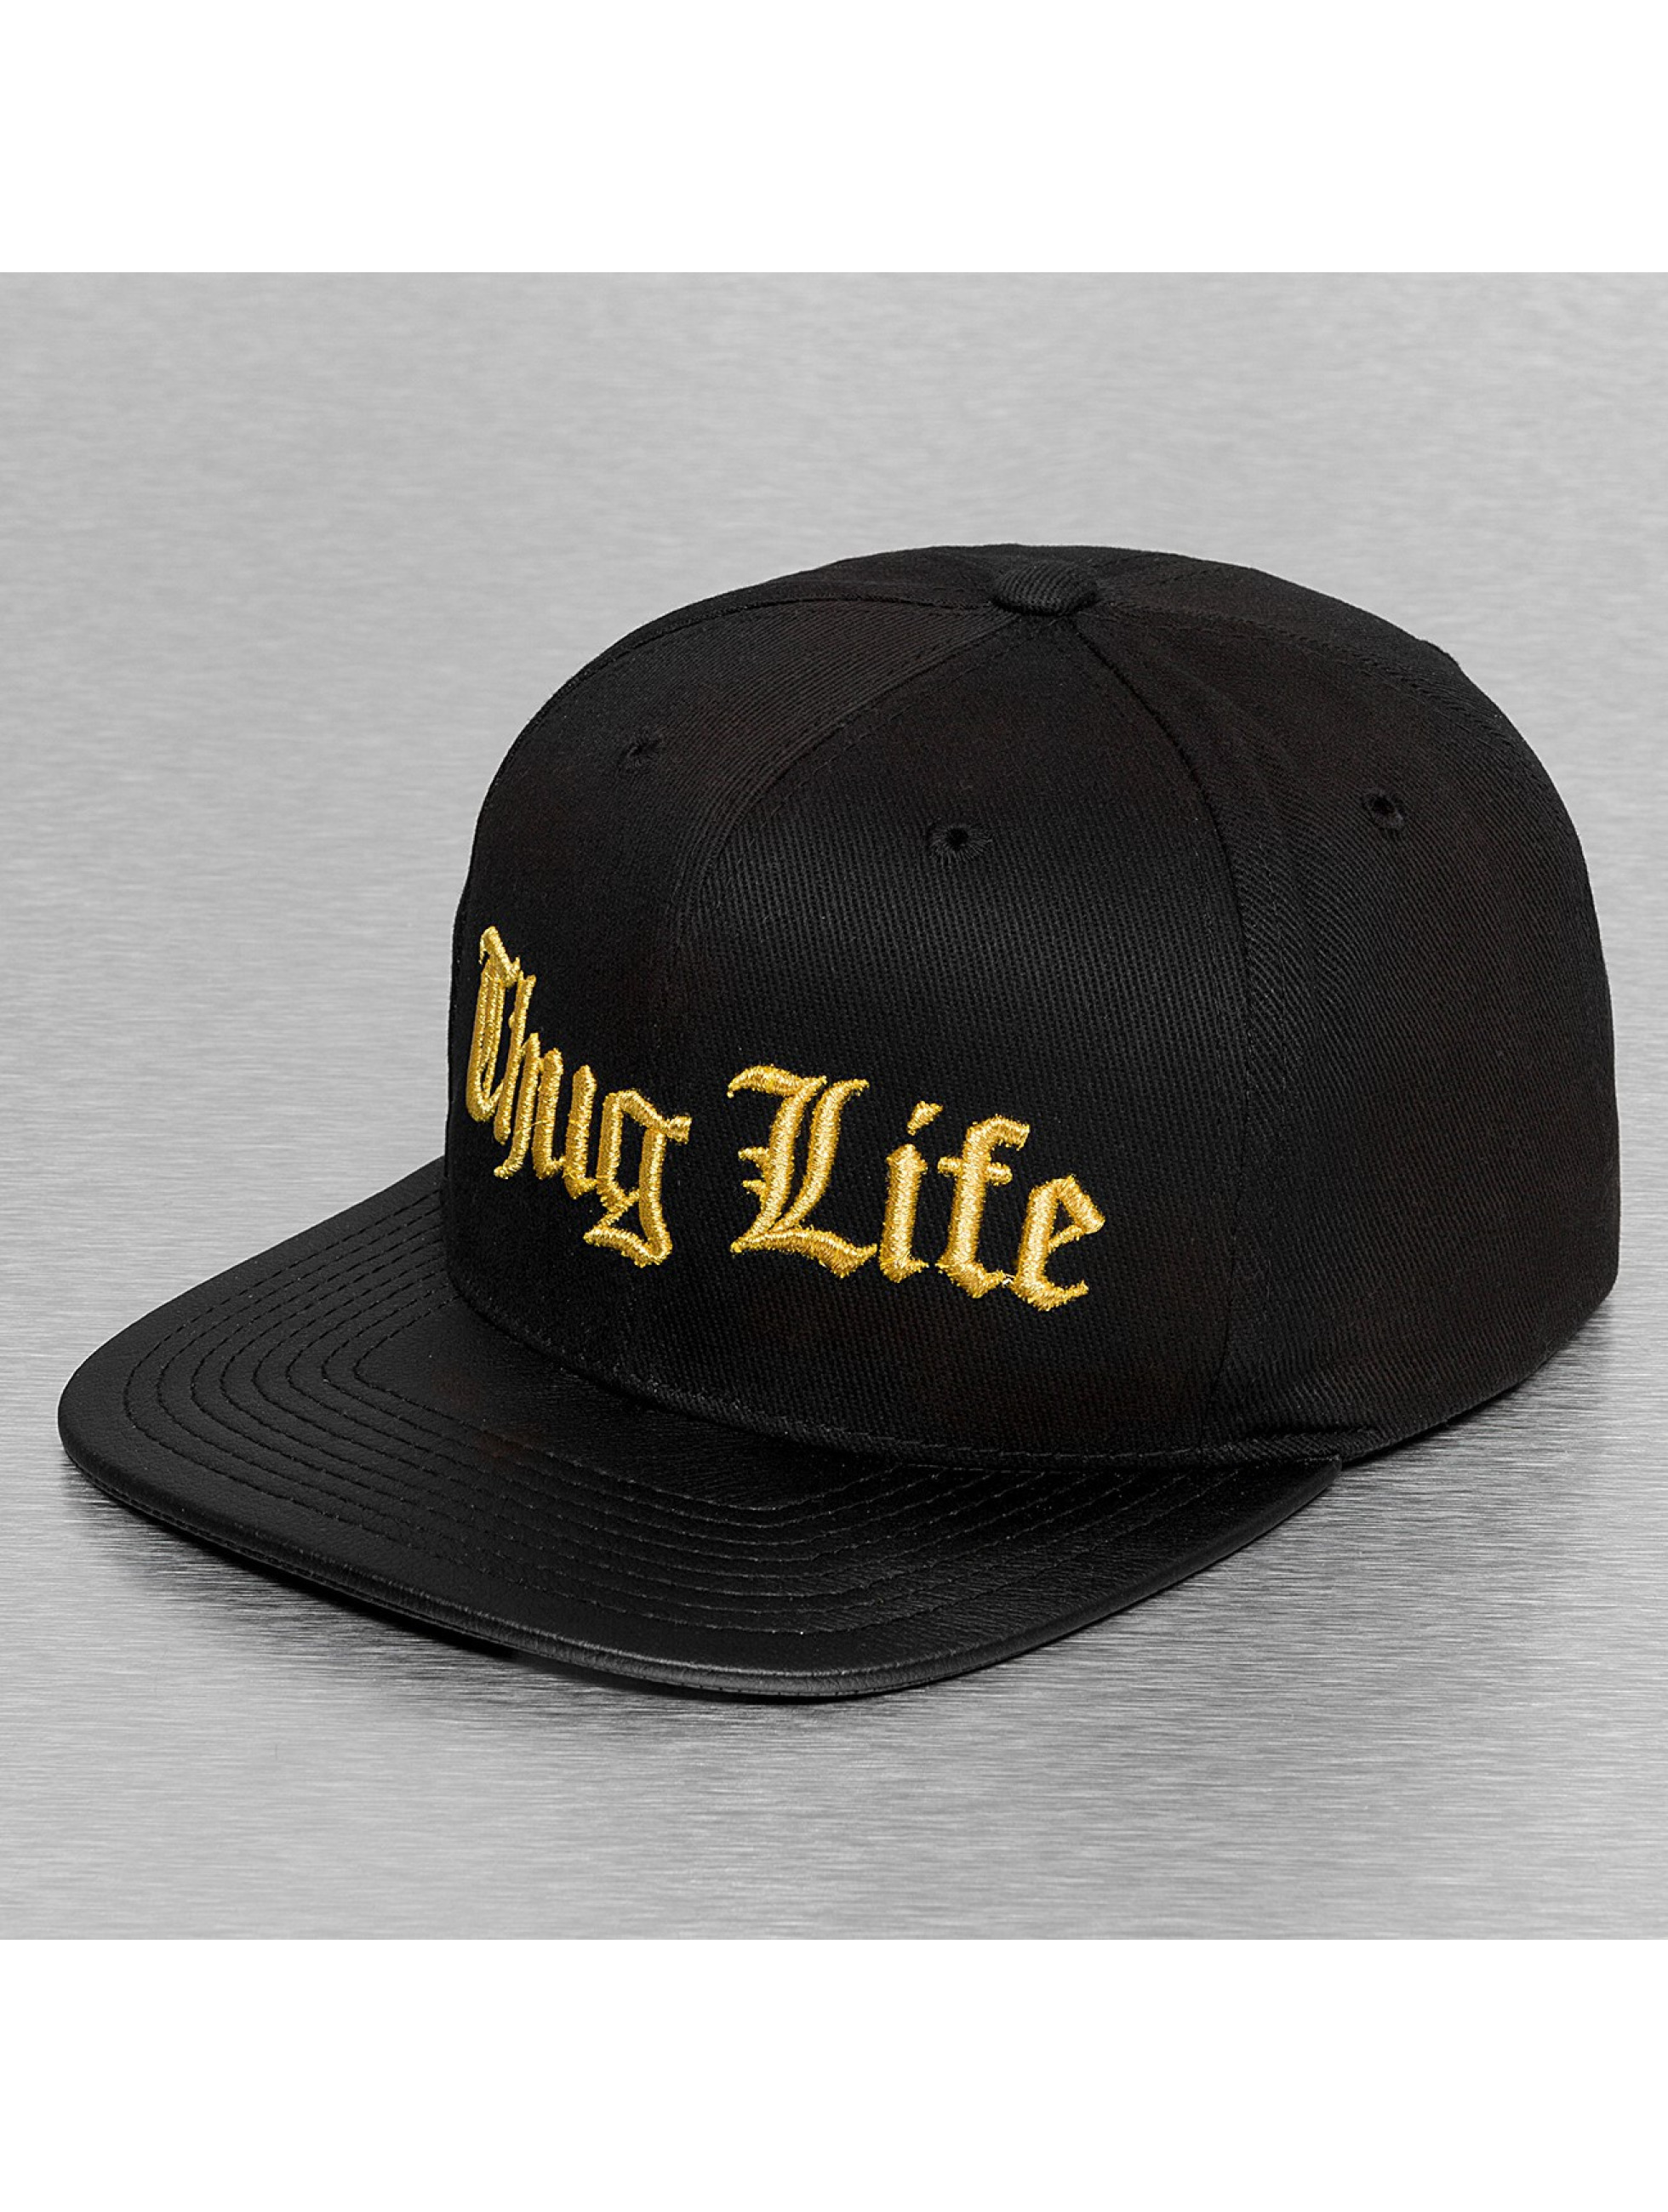 Thug Life Casquette Snapback & Strapback Golden Logo noir